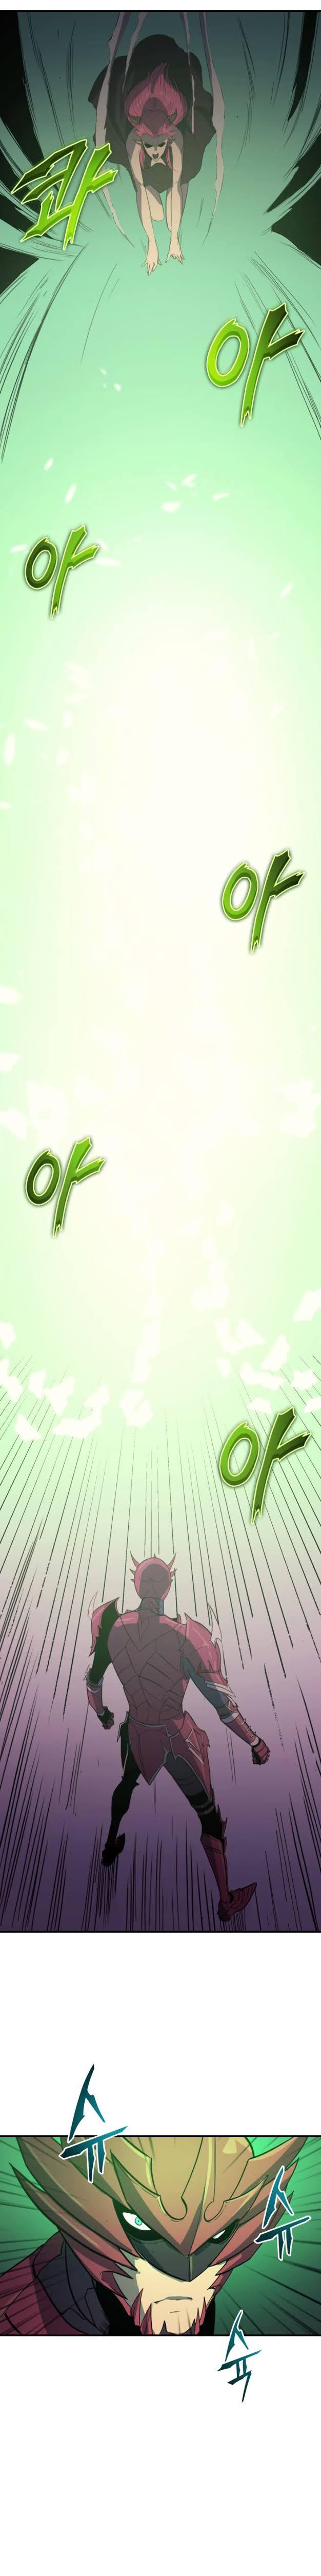 Max Level Returner - หน้า 9